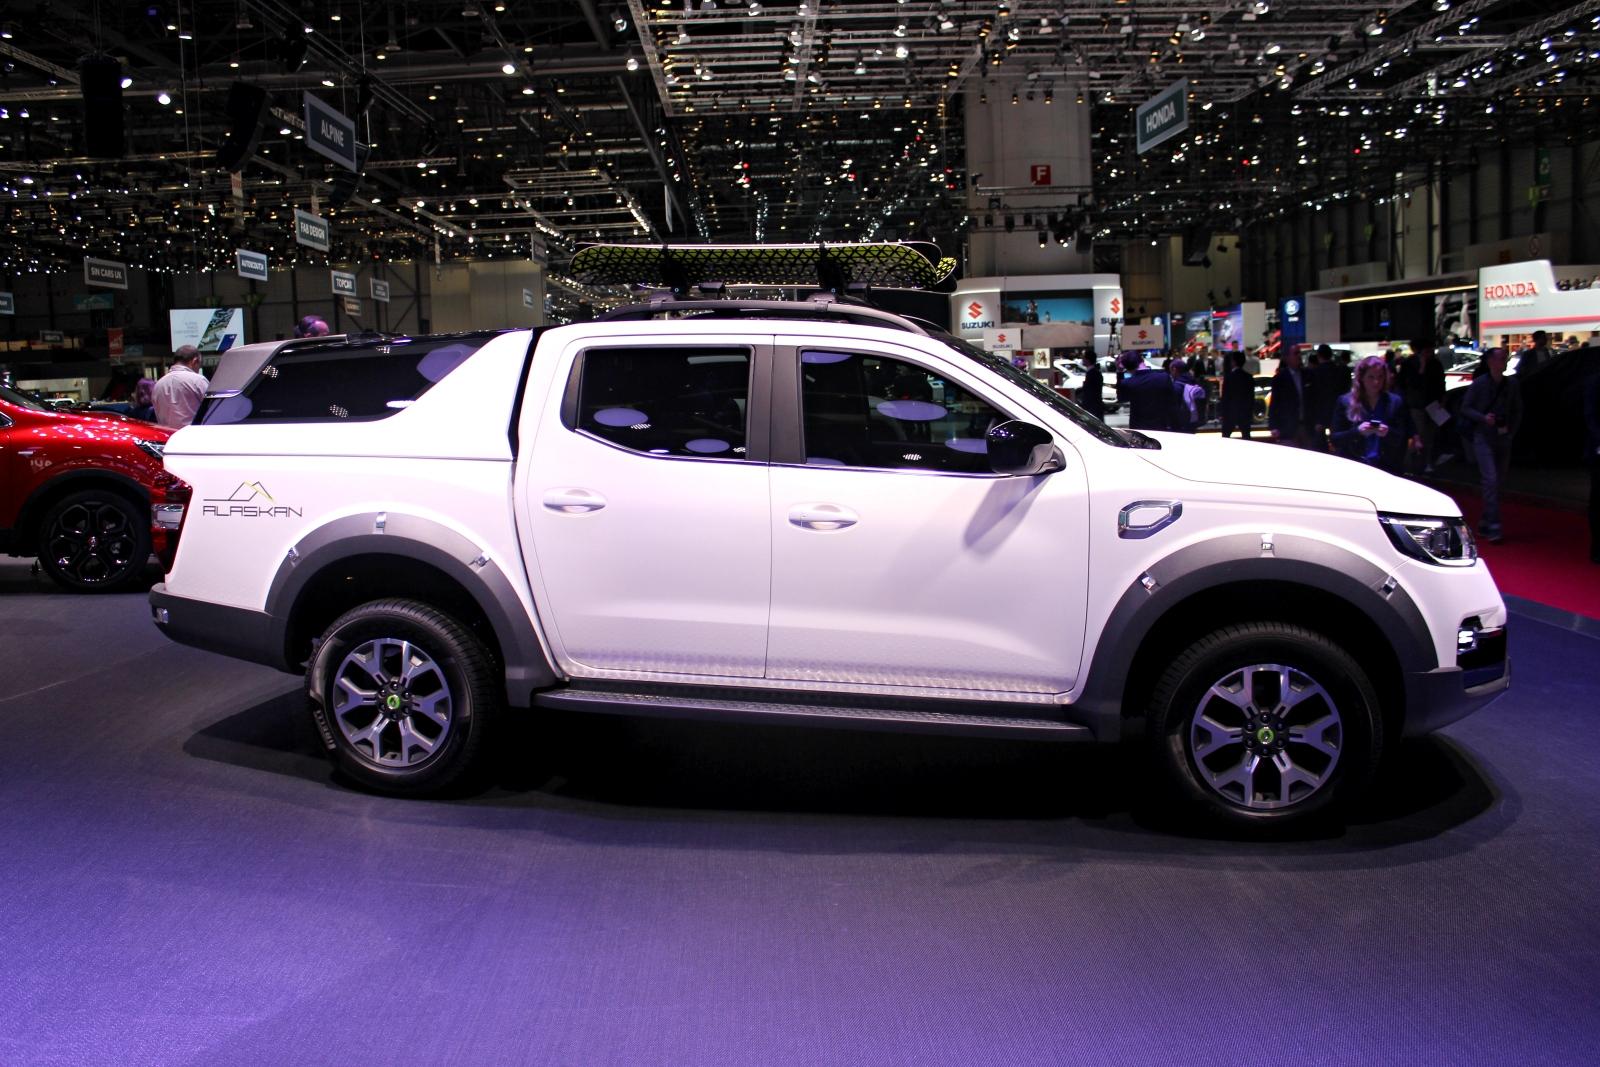 2016 - [Renault] Alaskan [U60] - Page 6 S0-renault-alaskan-en-direct-du-salon-de-geneve-2017-398360